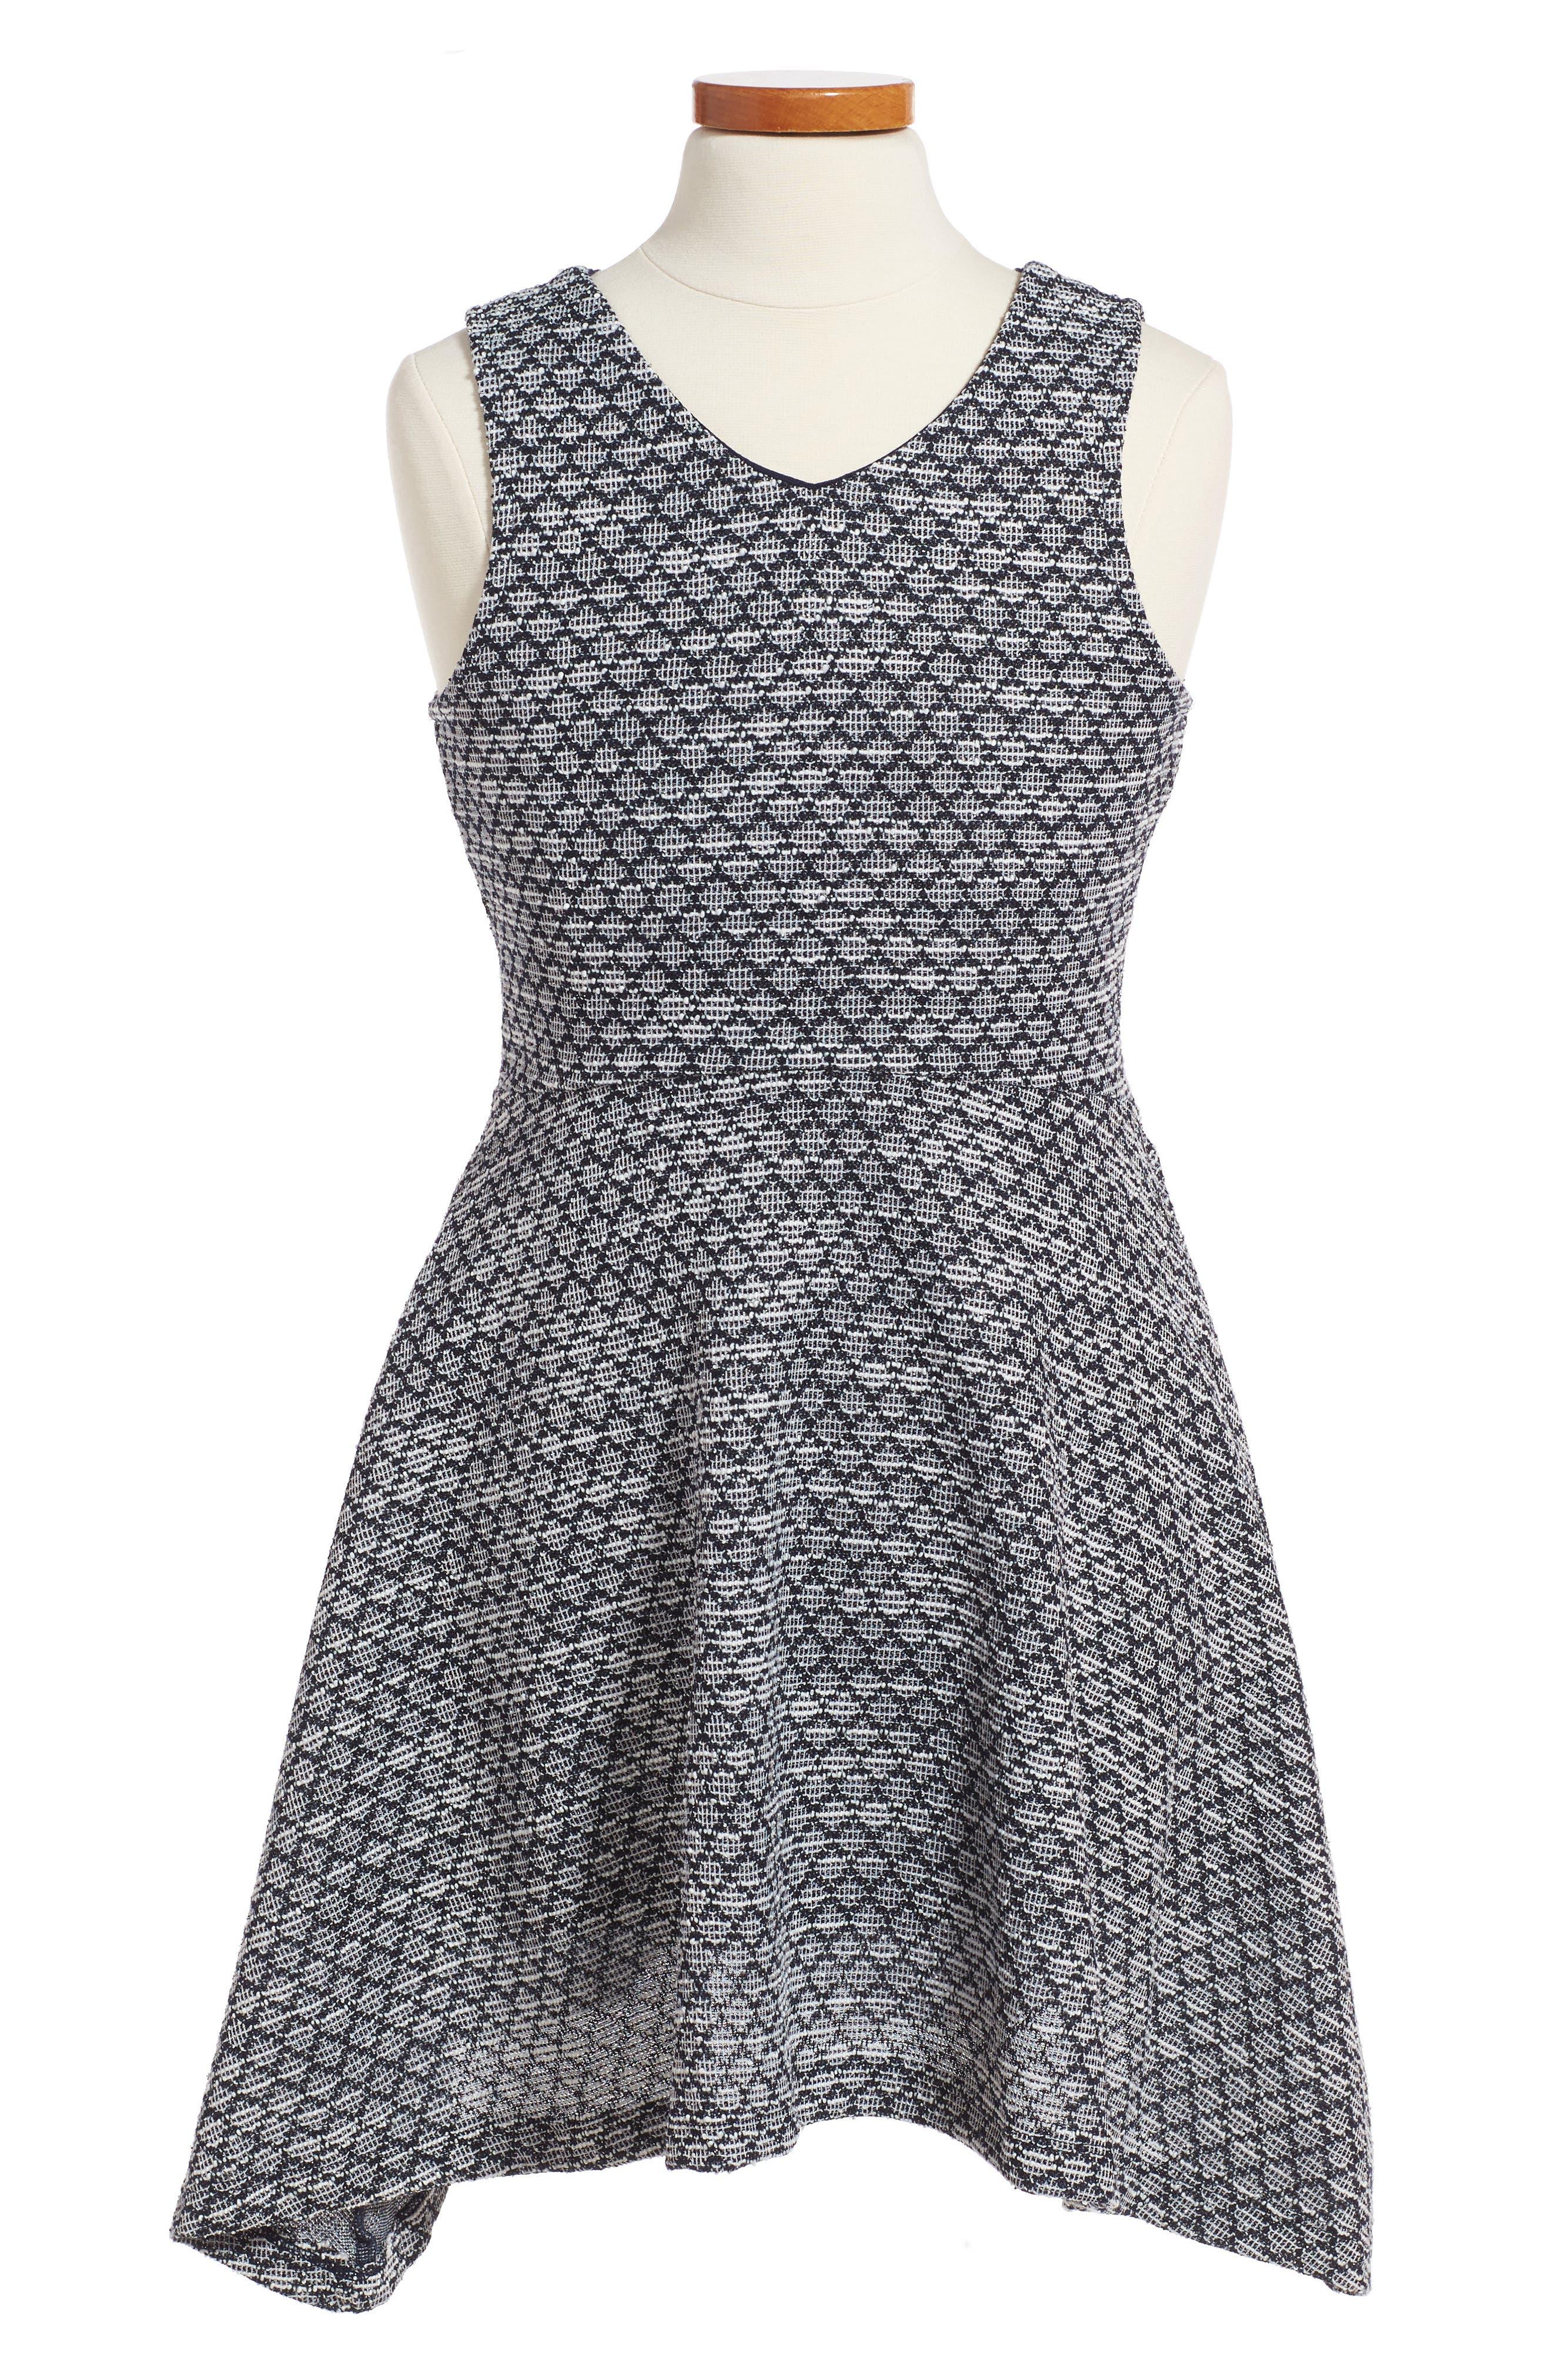 Lolita Sleeveless Skater Dress,                         Main,                         color, Navy